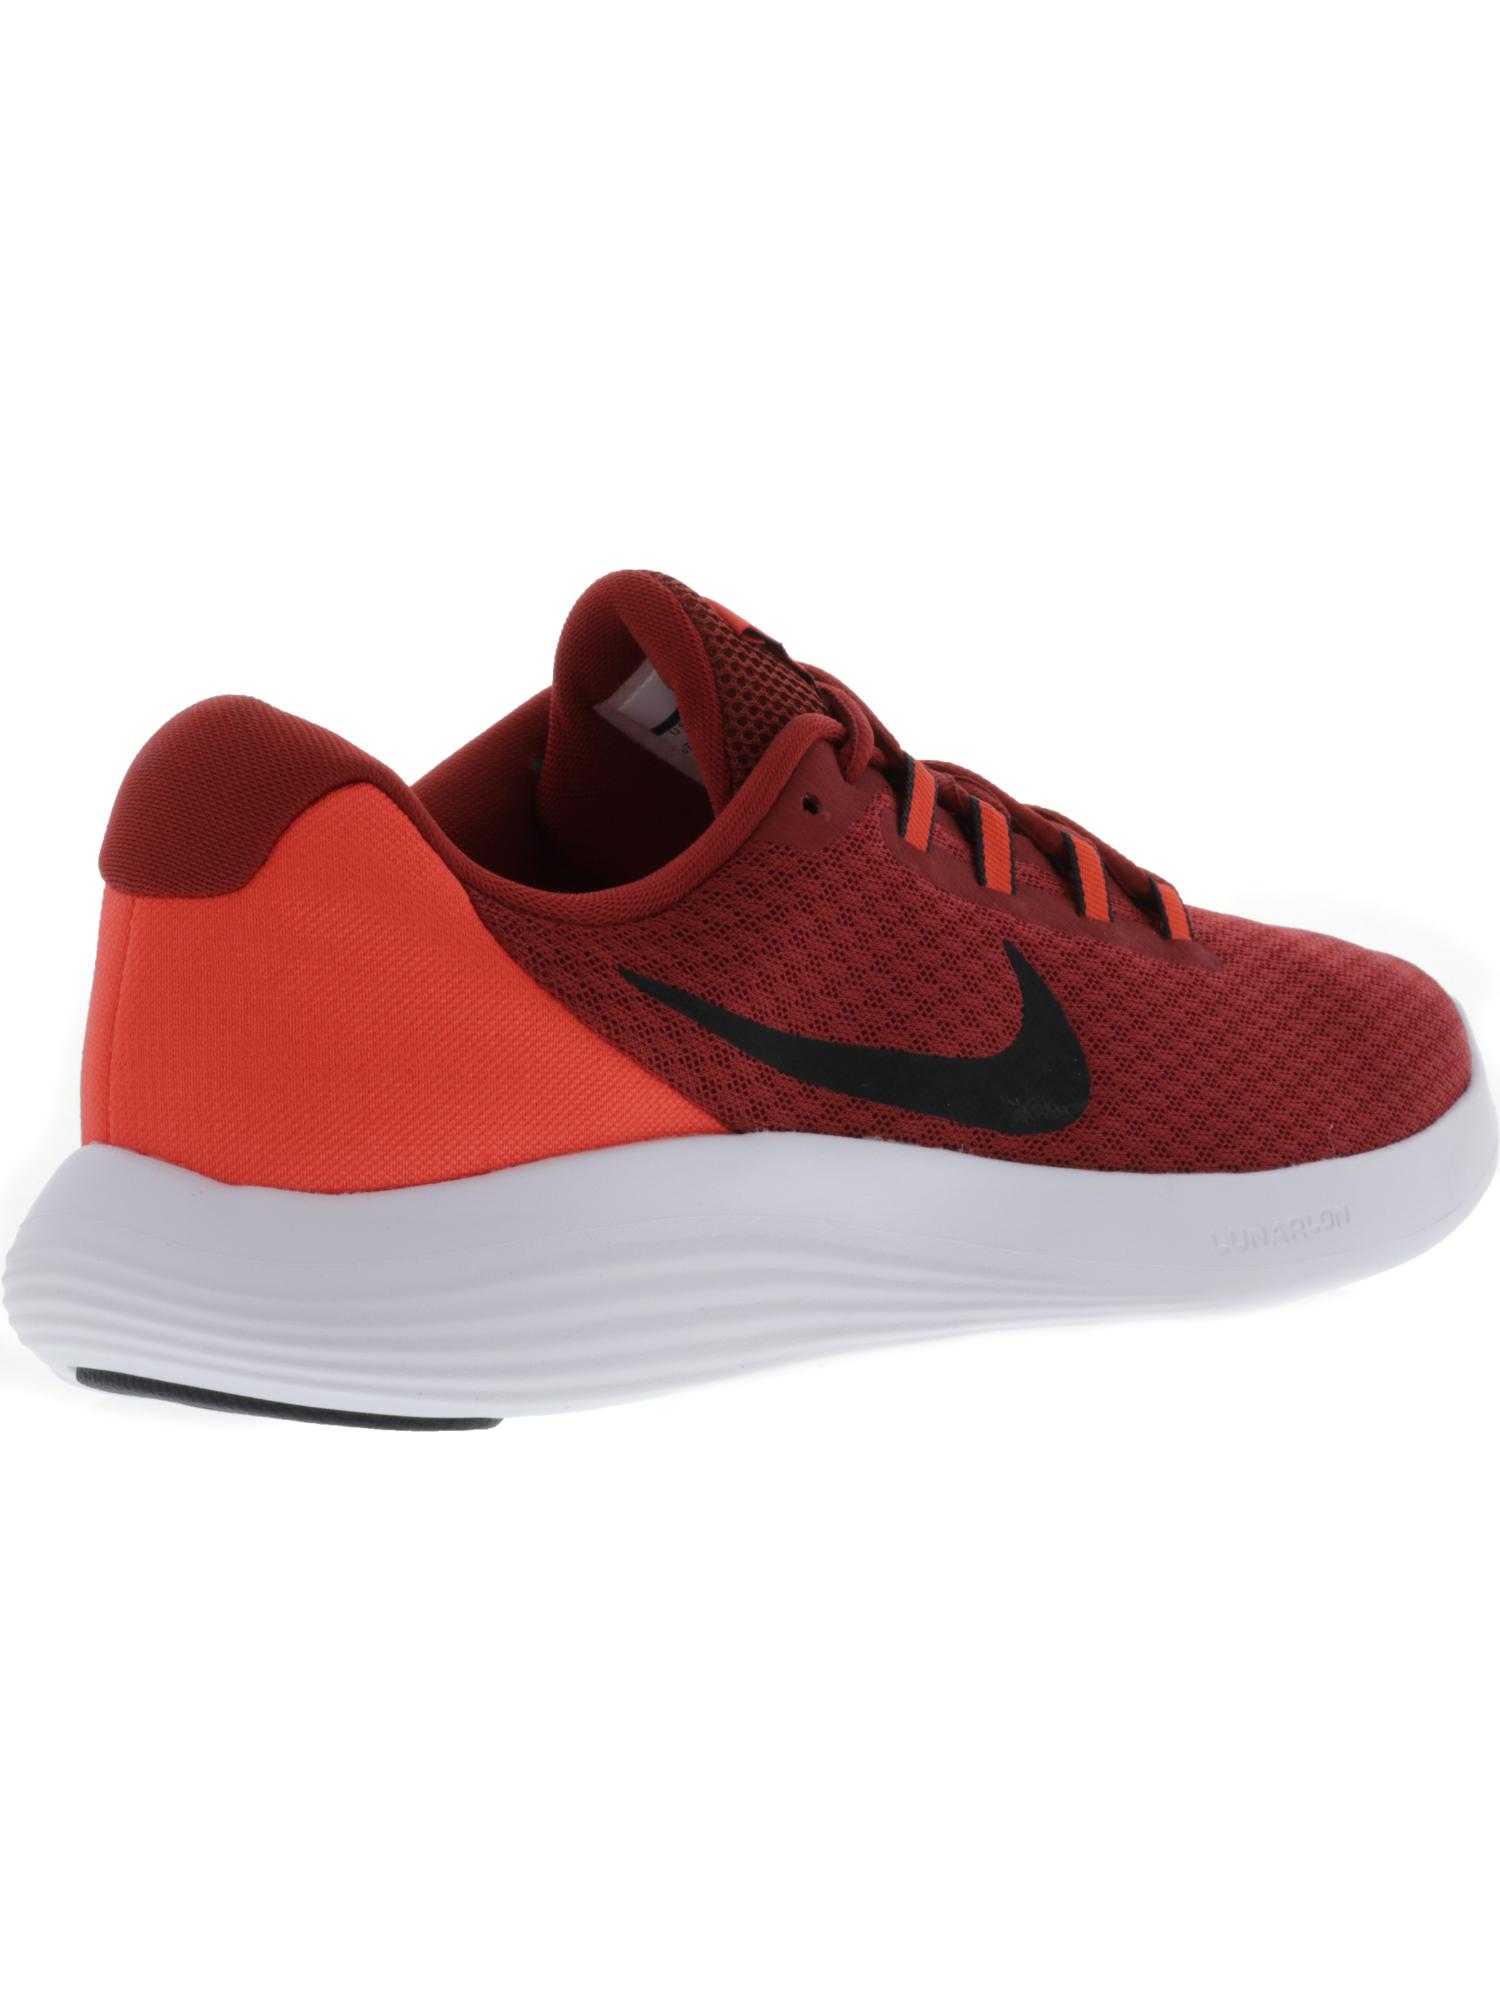 0b955e6330b Nike Men s Lunarconverge Ankle-High Running Shoe